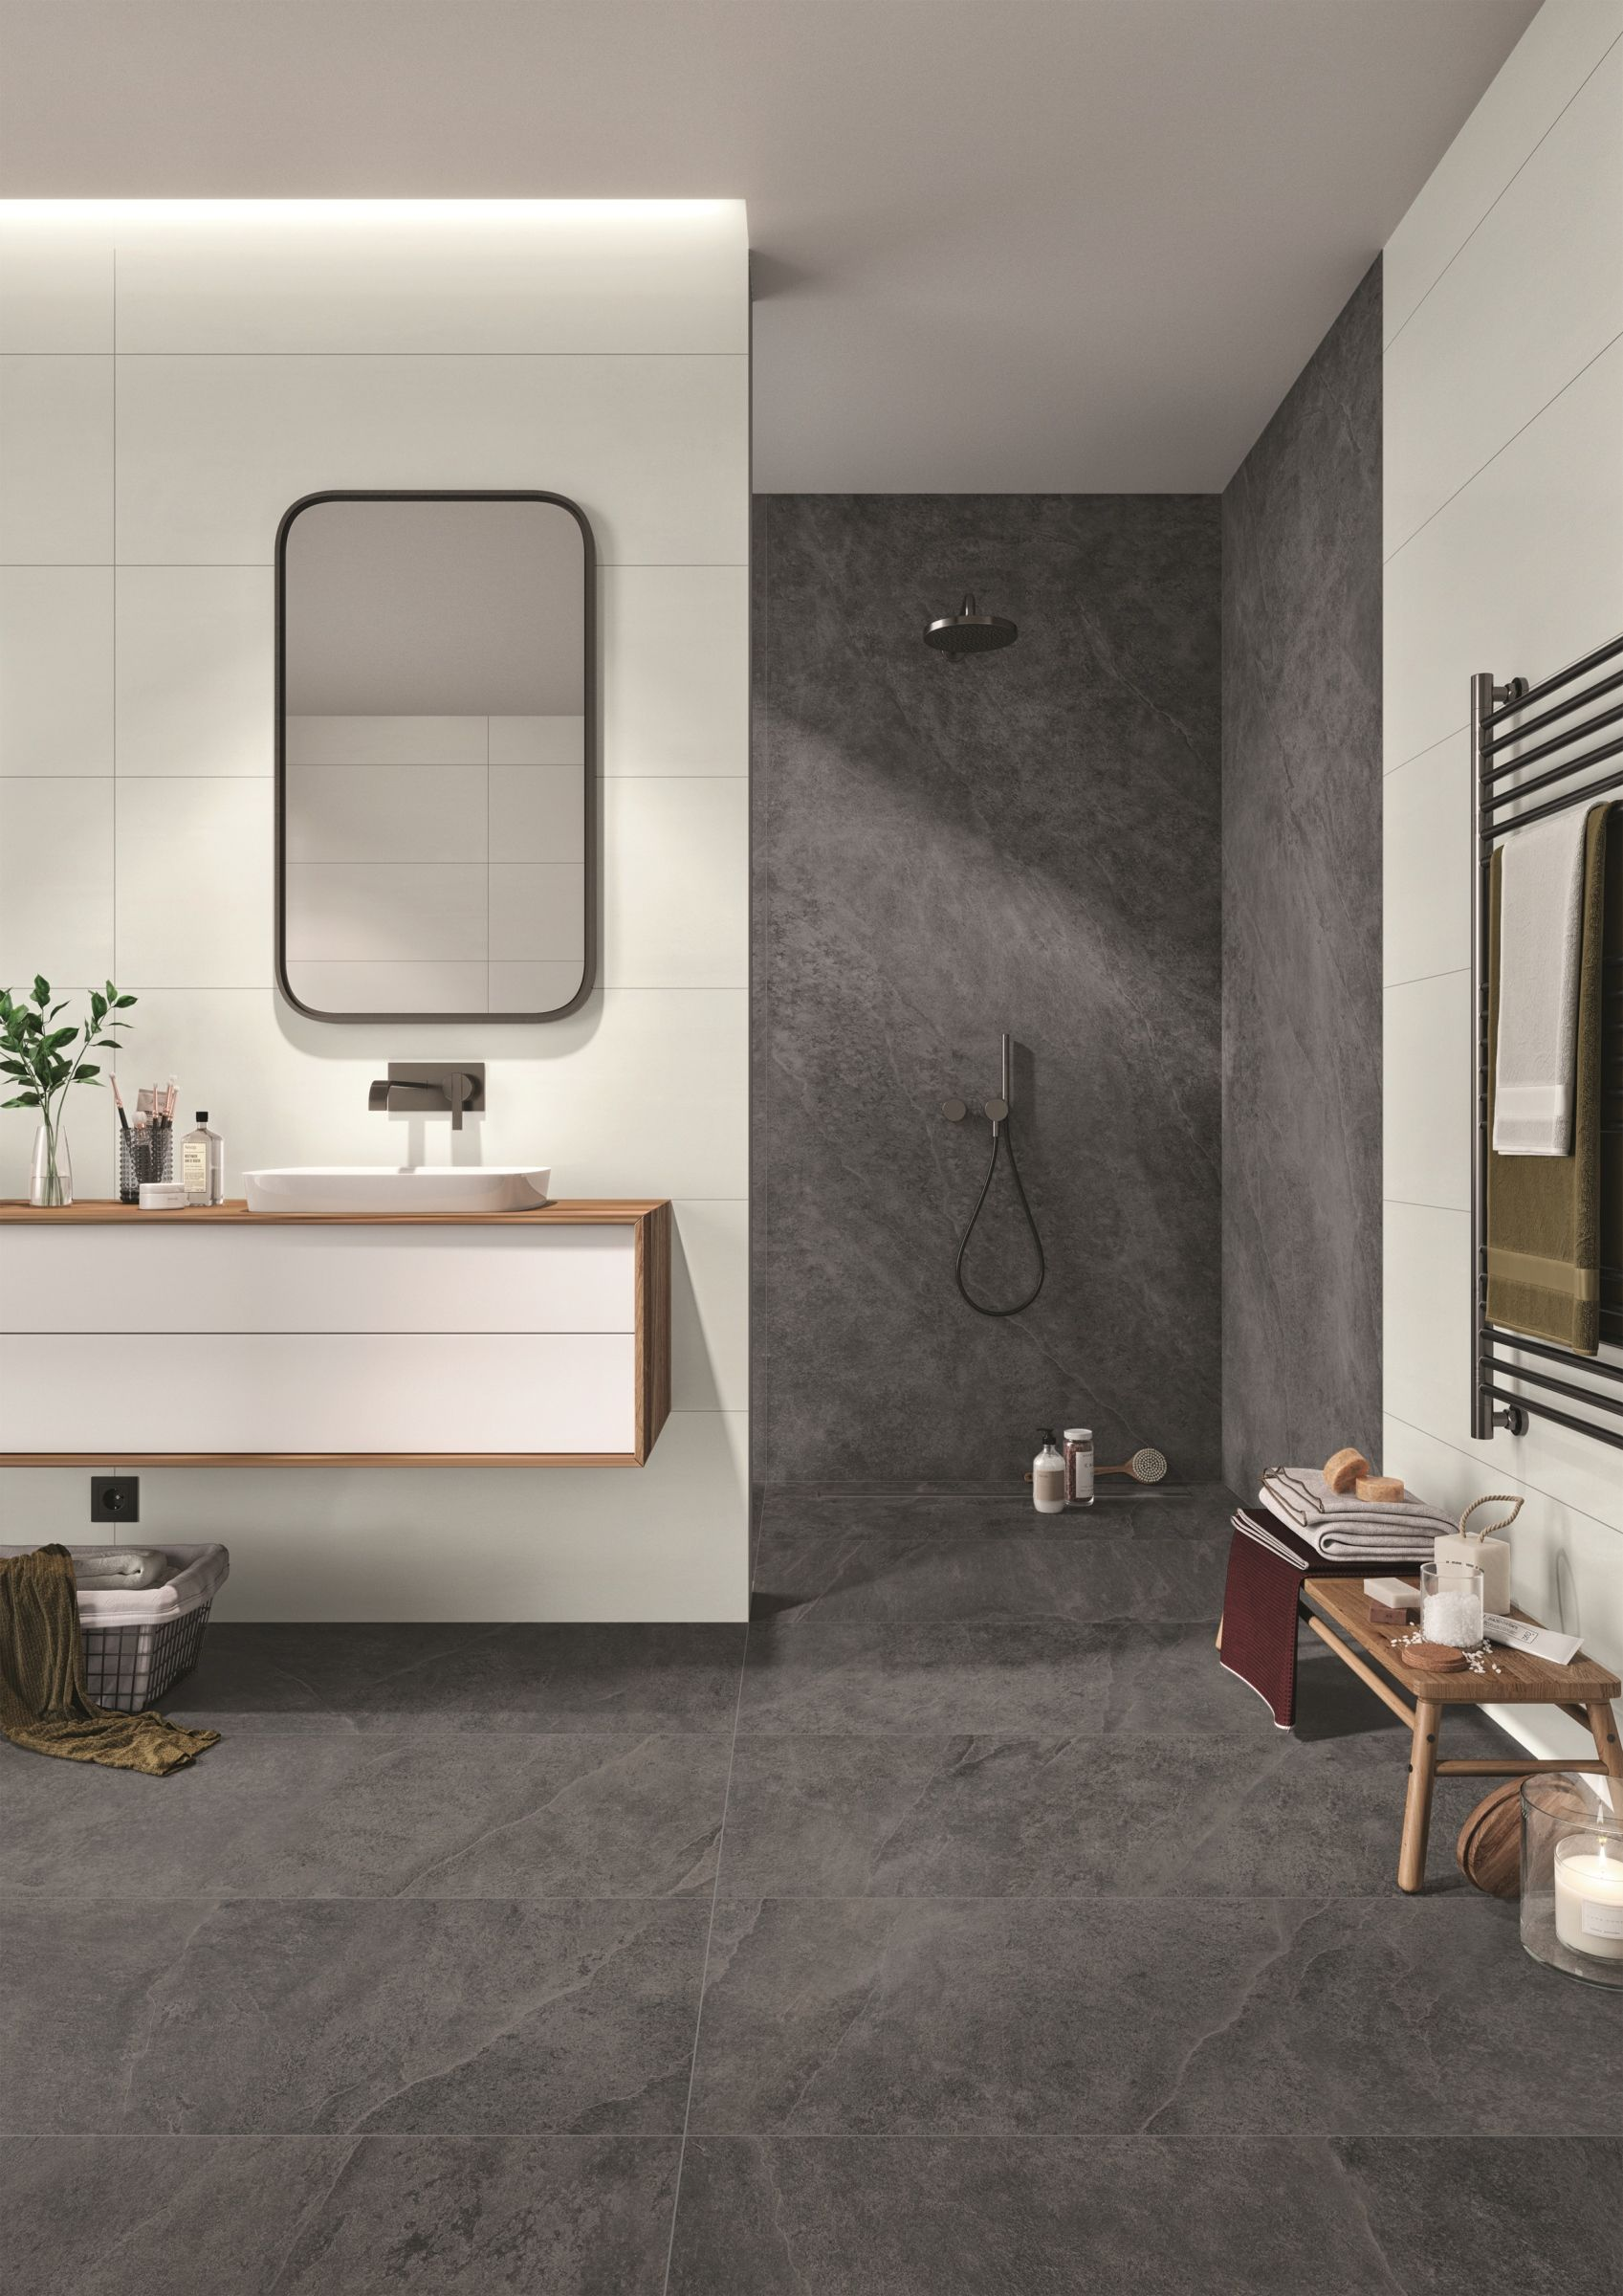 Modernes Badezimmer Badezimmer Fliesen Badezimmer Design Badezimmer